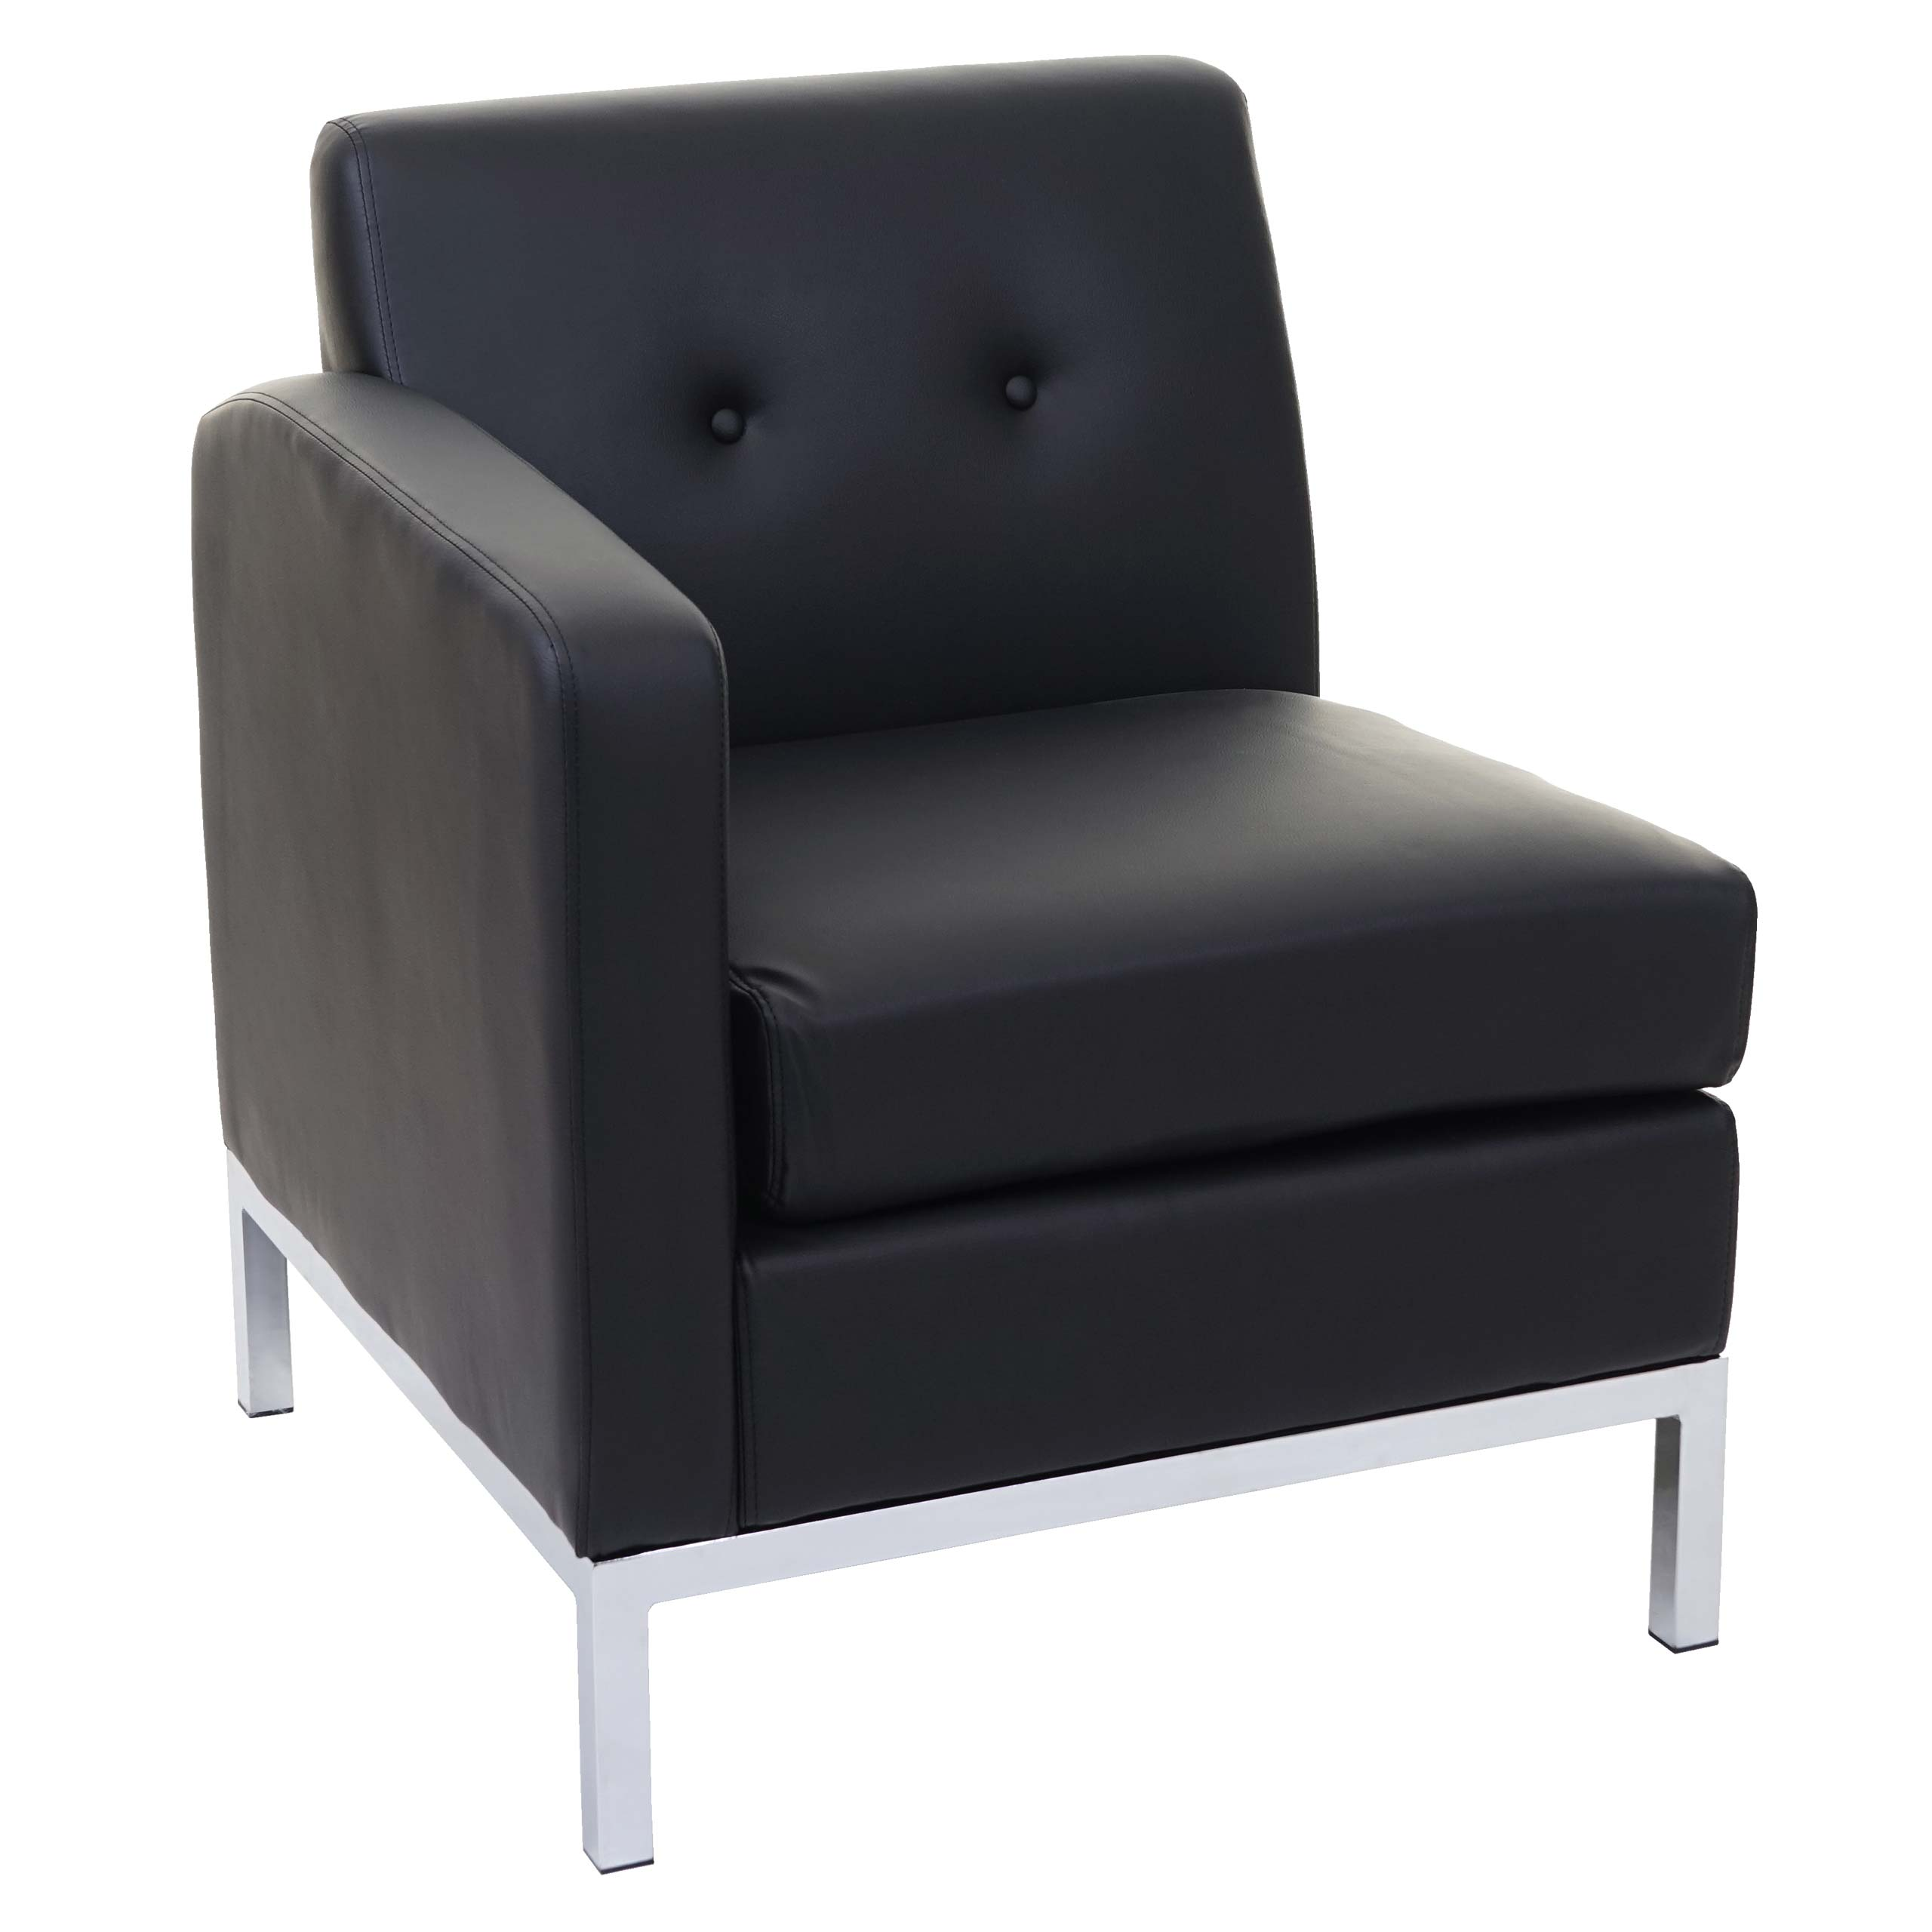 Sessel Hwc C19 Modular Sofa Seitenteil Links Mit Armlehne